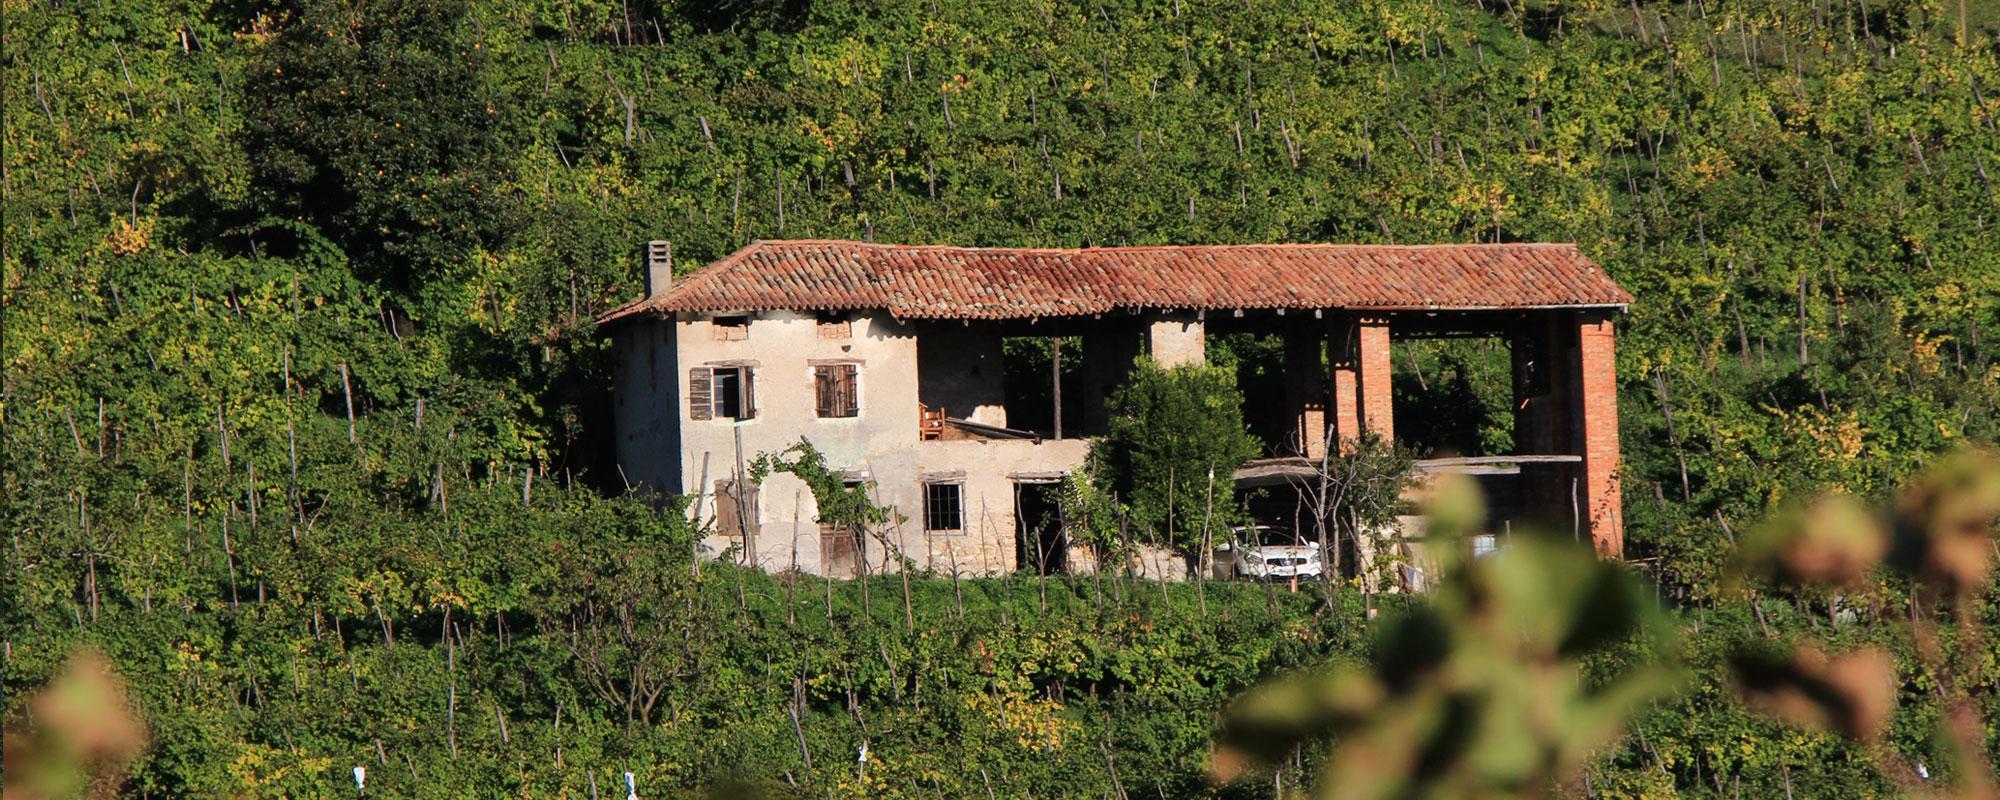 prosecco-automne-vignes